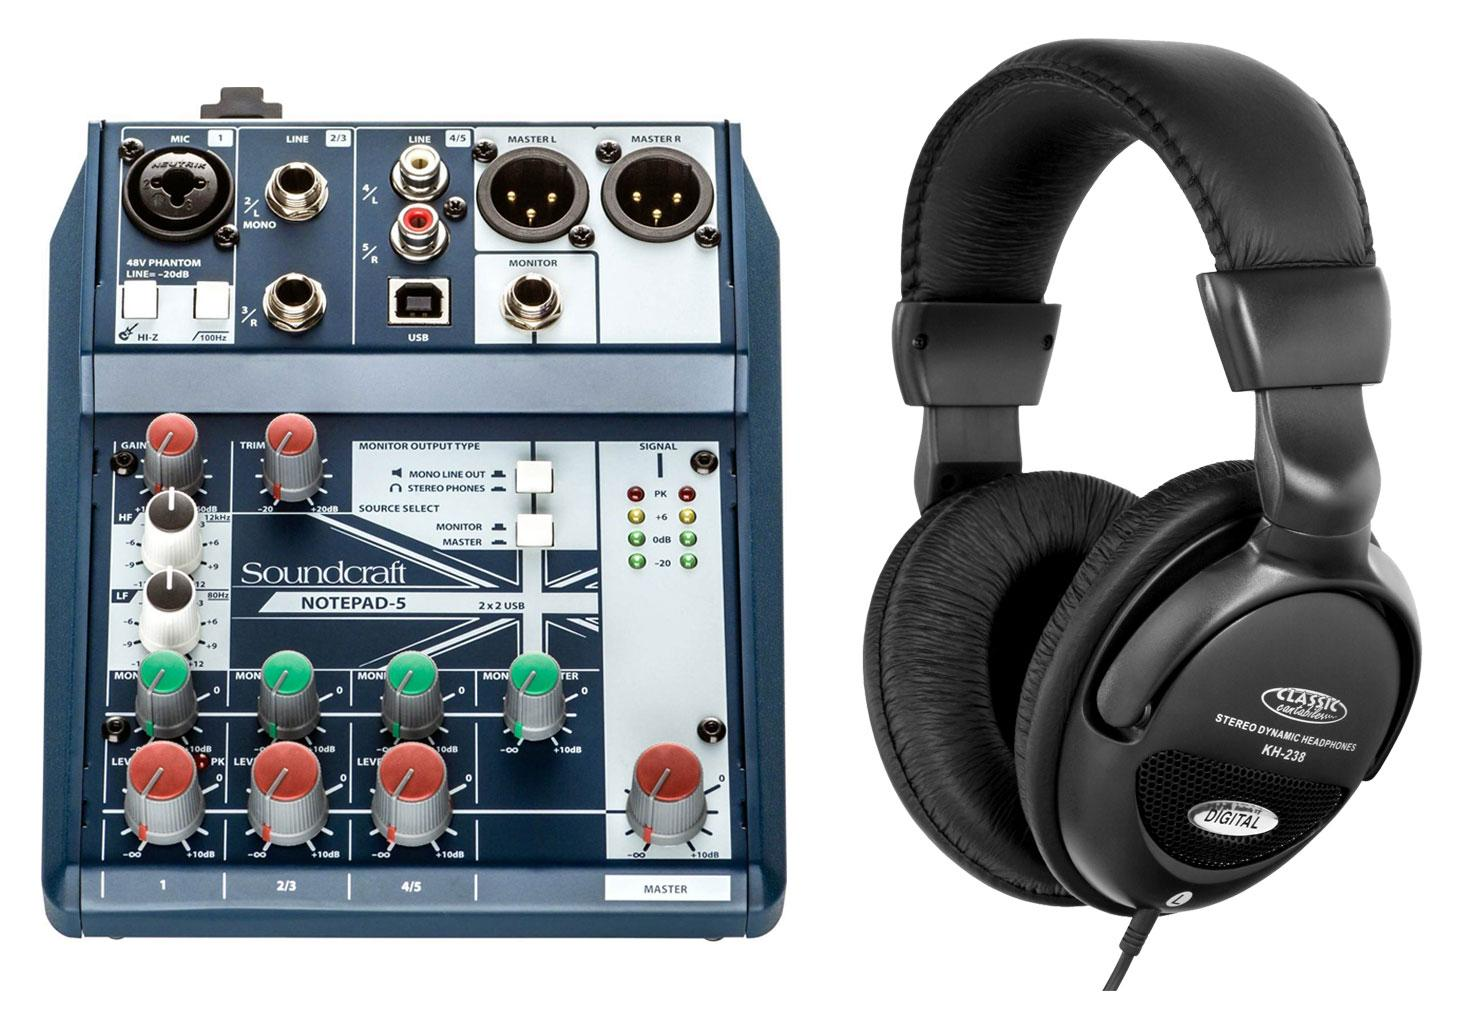 Soundcraft Notepad 5 Kompaktmischpult Set inkl. Kopfhörer